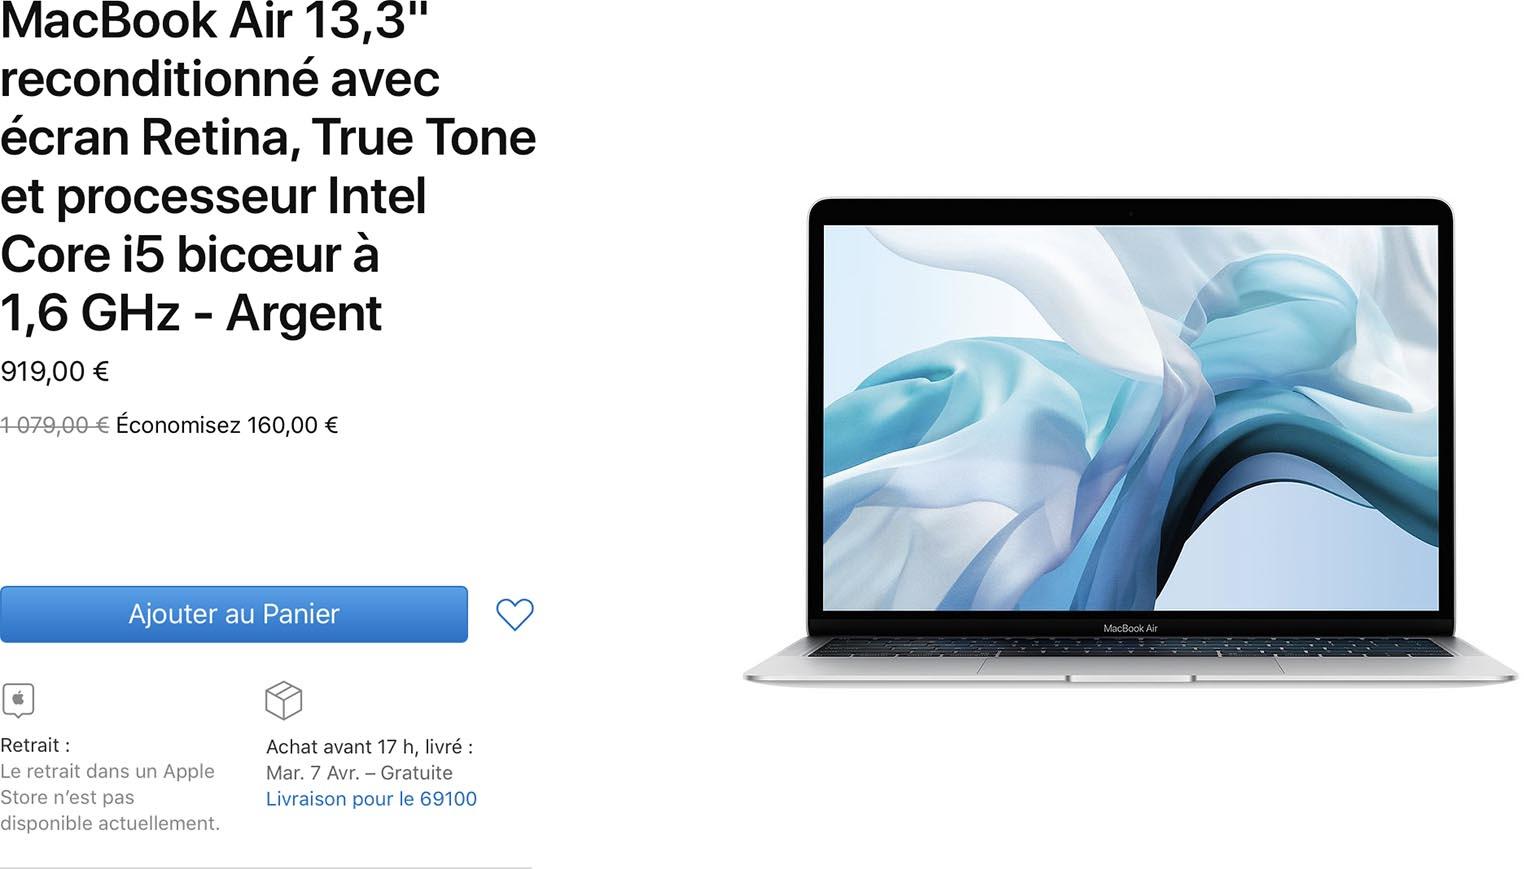 MacBook Air 2019 Refurb Store